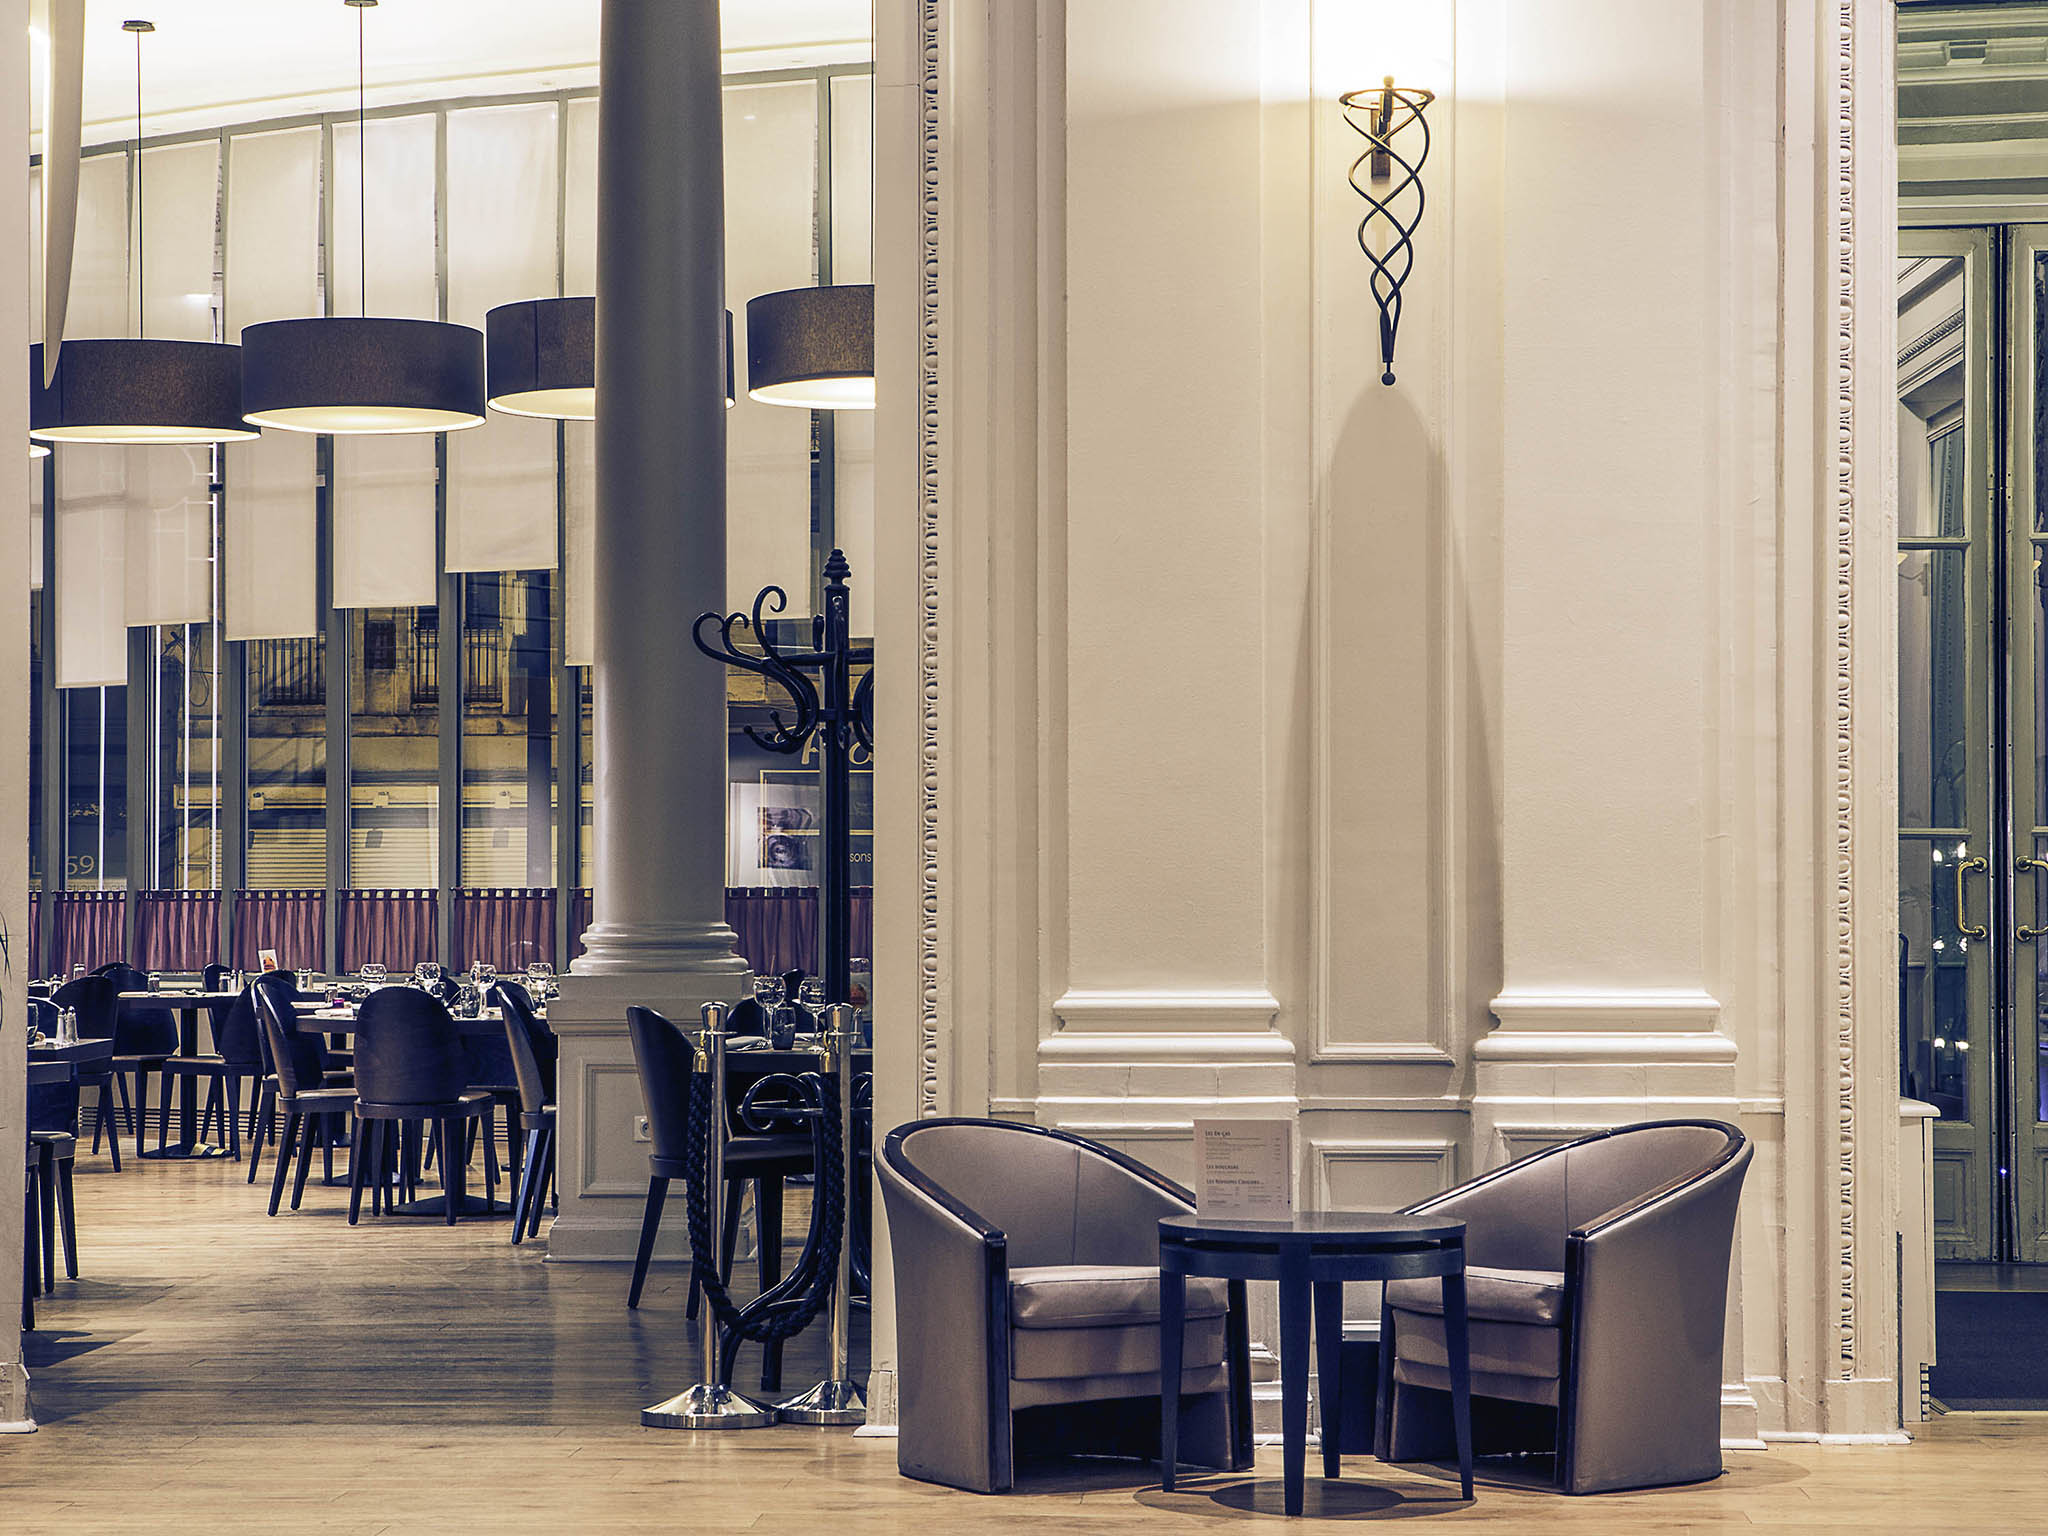 Hotel in ROUBAIX Mercure Lille Roubaix Grand Htel